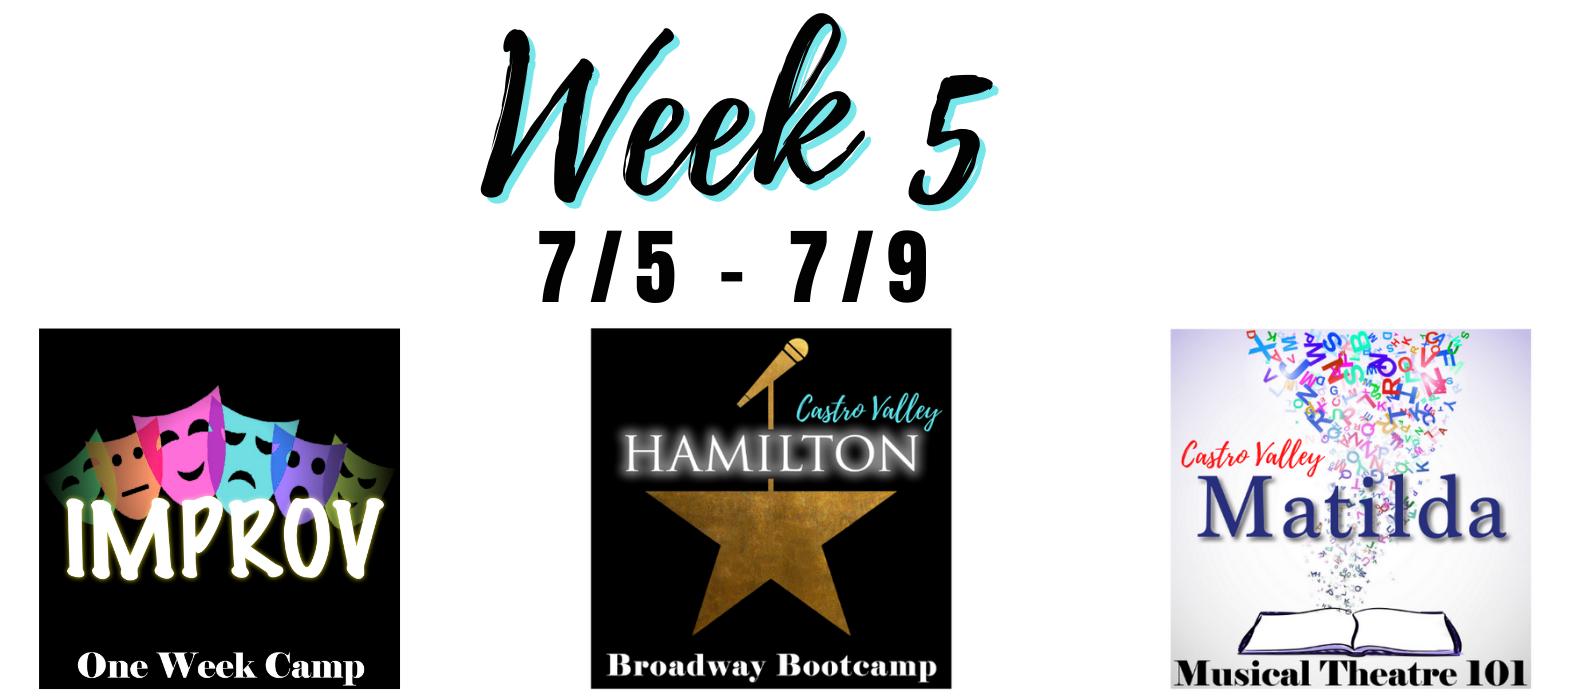 web banner week 5 (1)